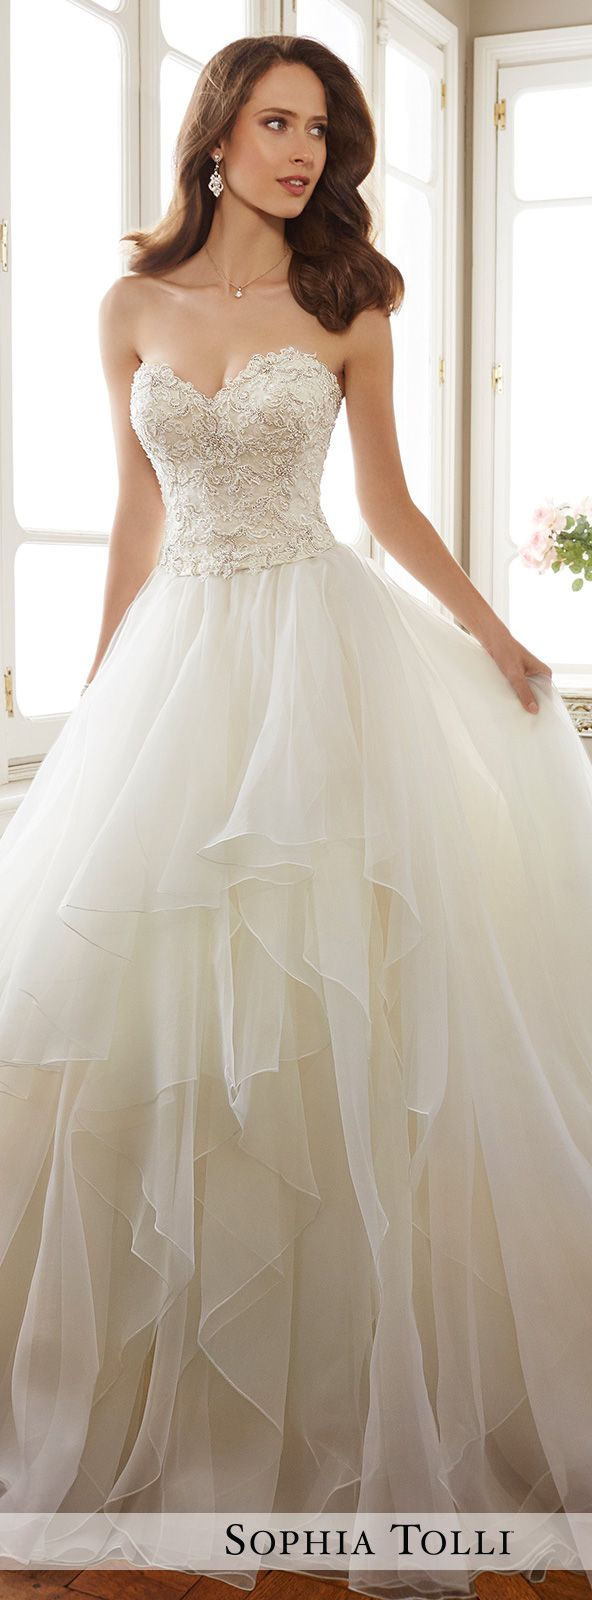 Wedding Dresses for 2017